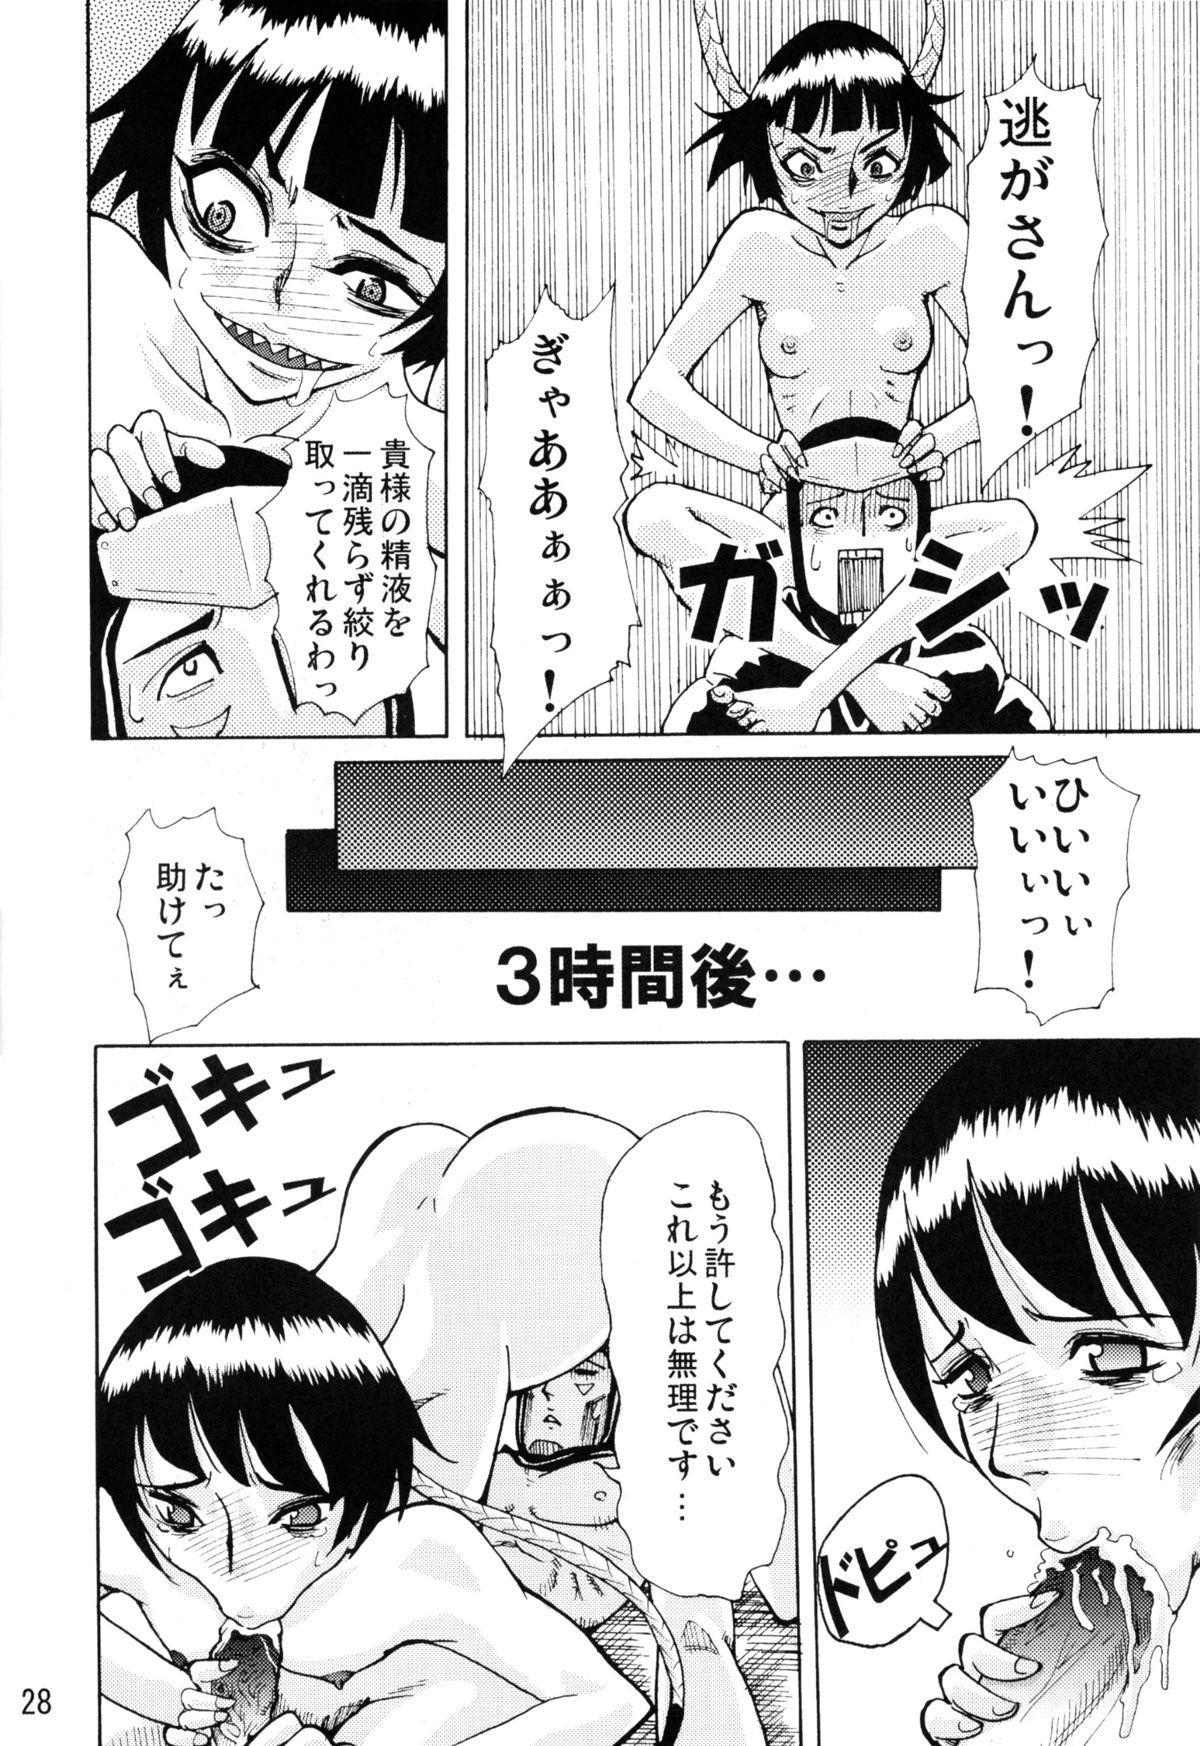 Kidou 26